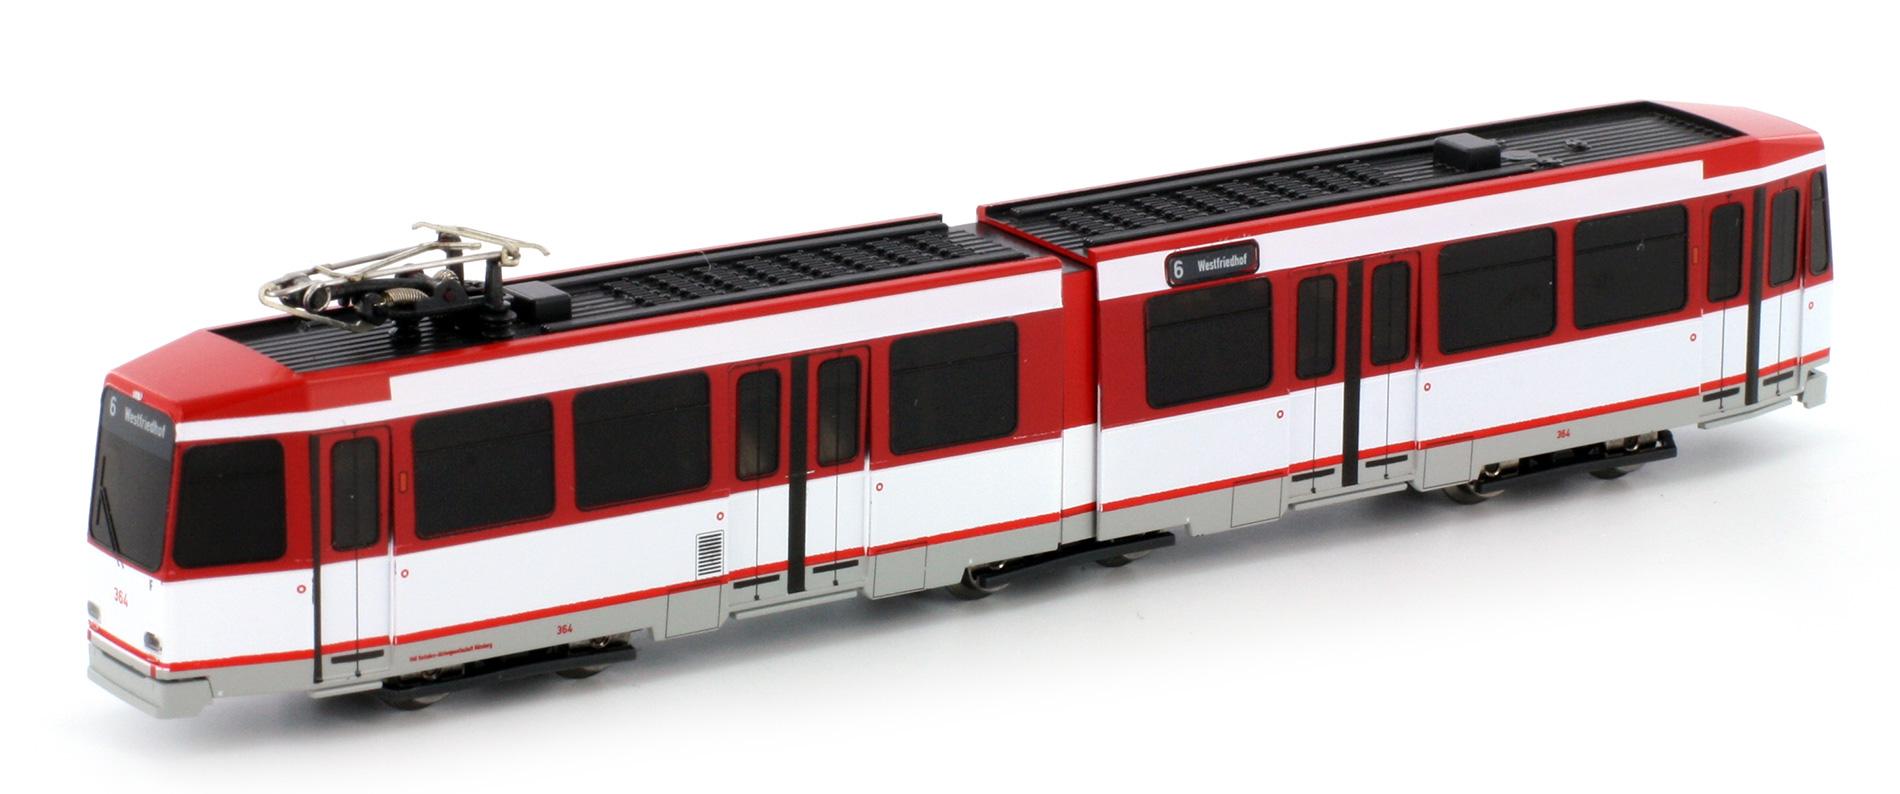 M6 0 60 >> Hobbytrain H14903 Düwag Typ M6 modellbahnshop-lippe.com